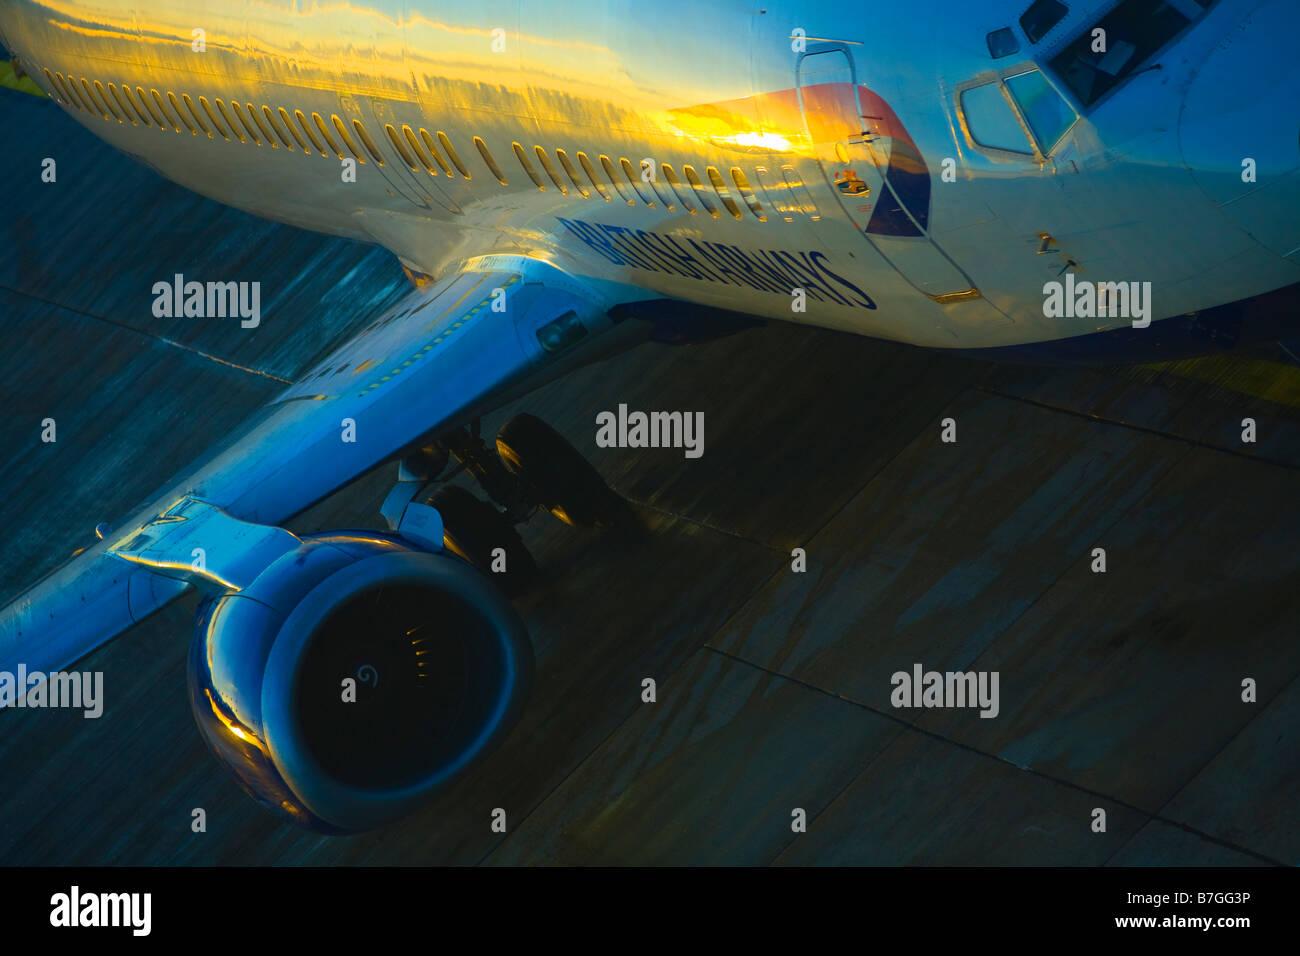 British Airways jet logo fuselage in evening sun Gatwick Airport London England UK GB - Stock Image